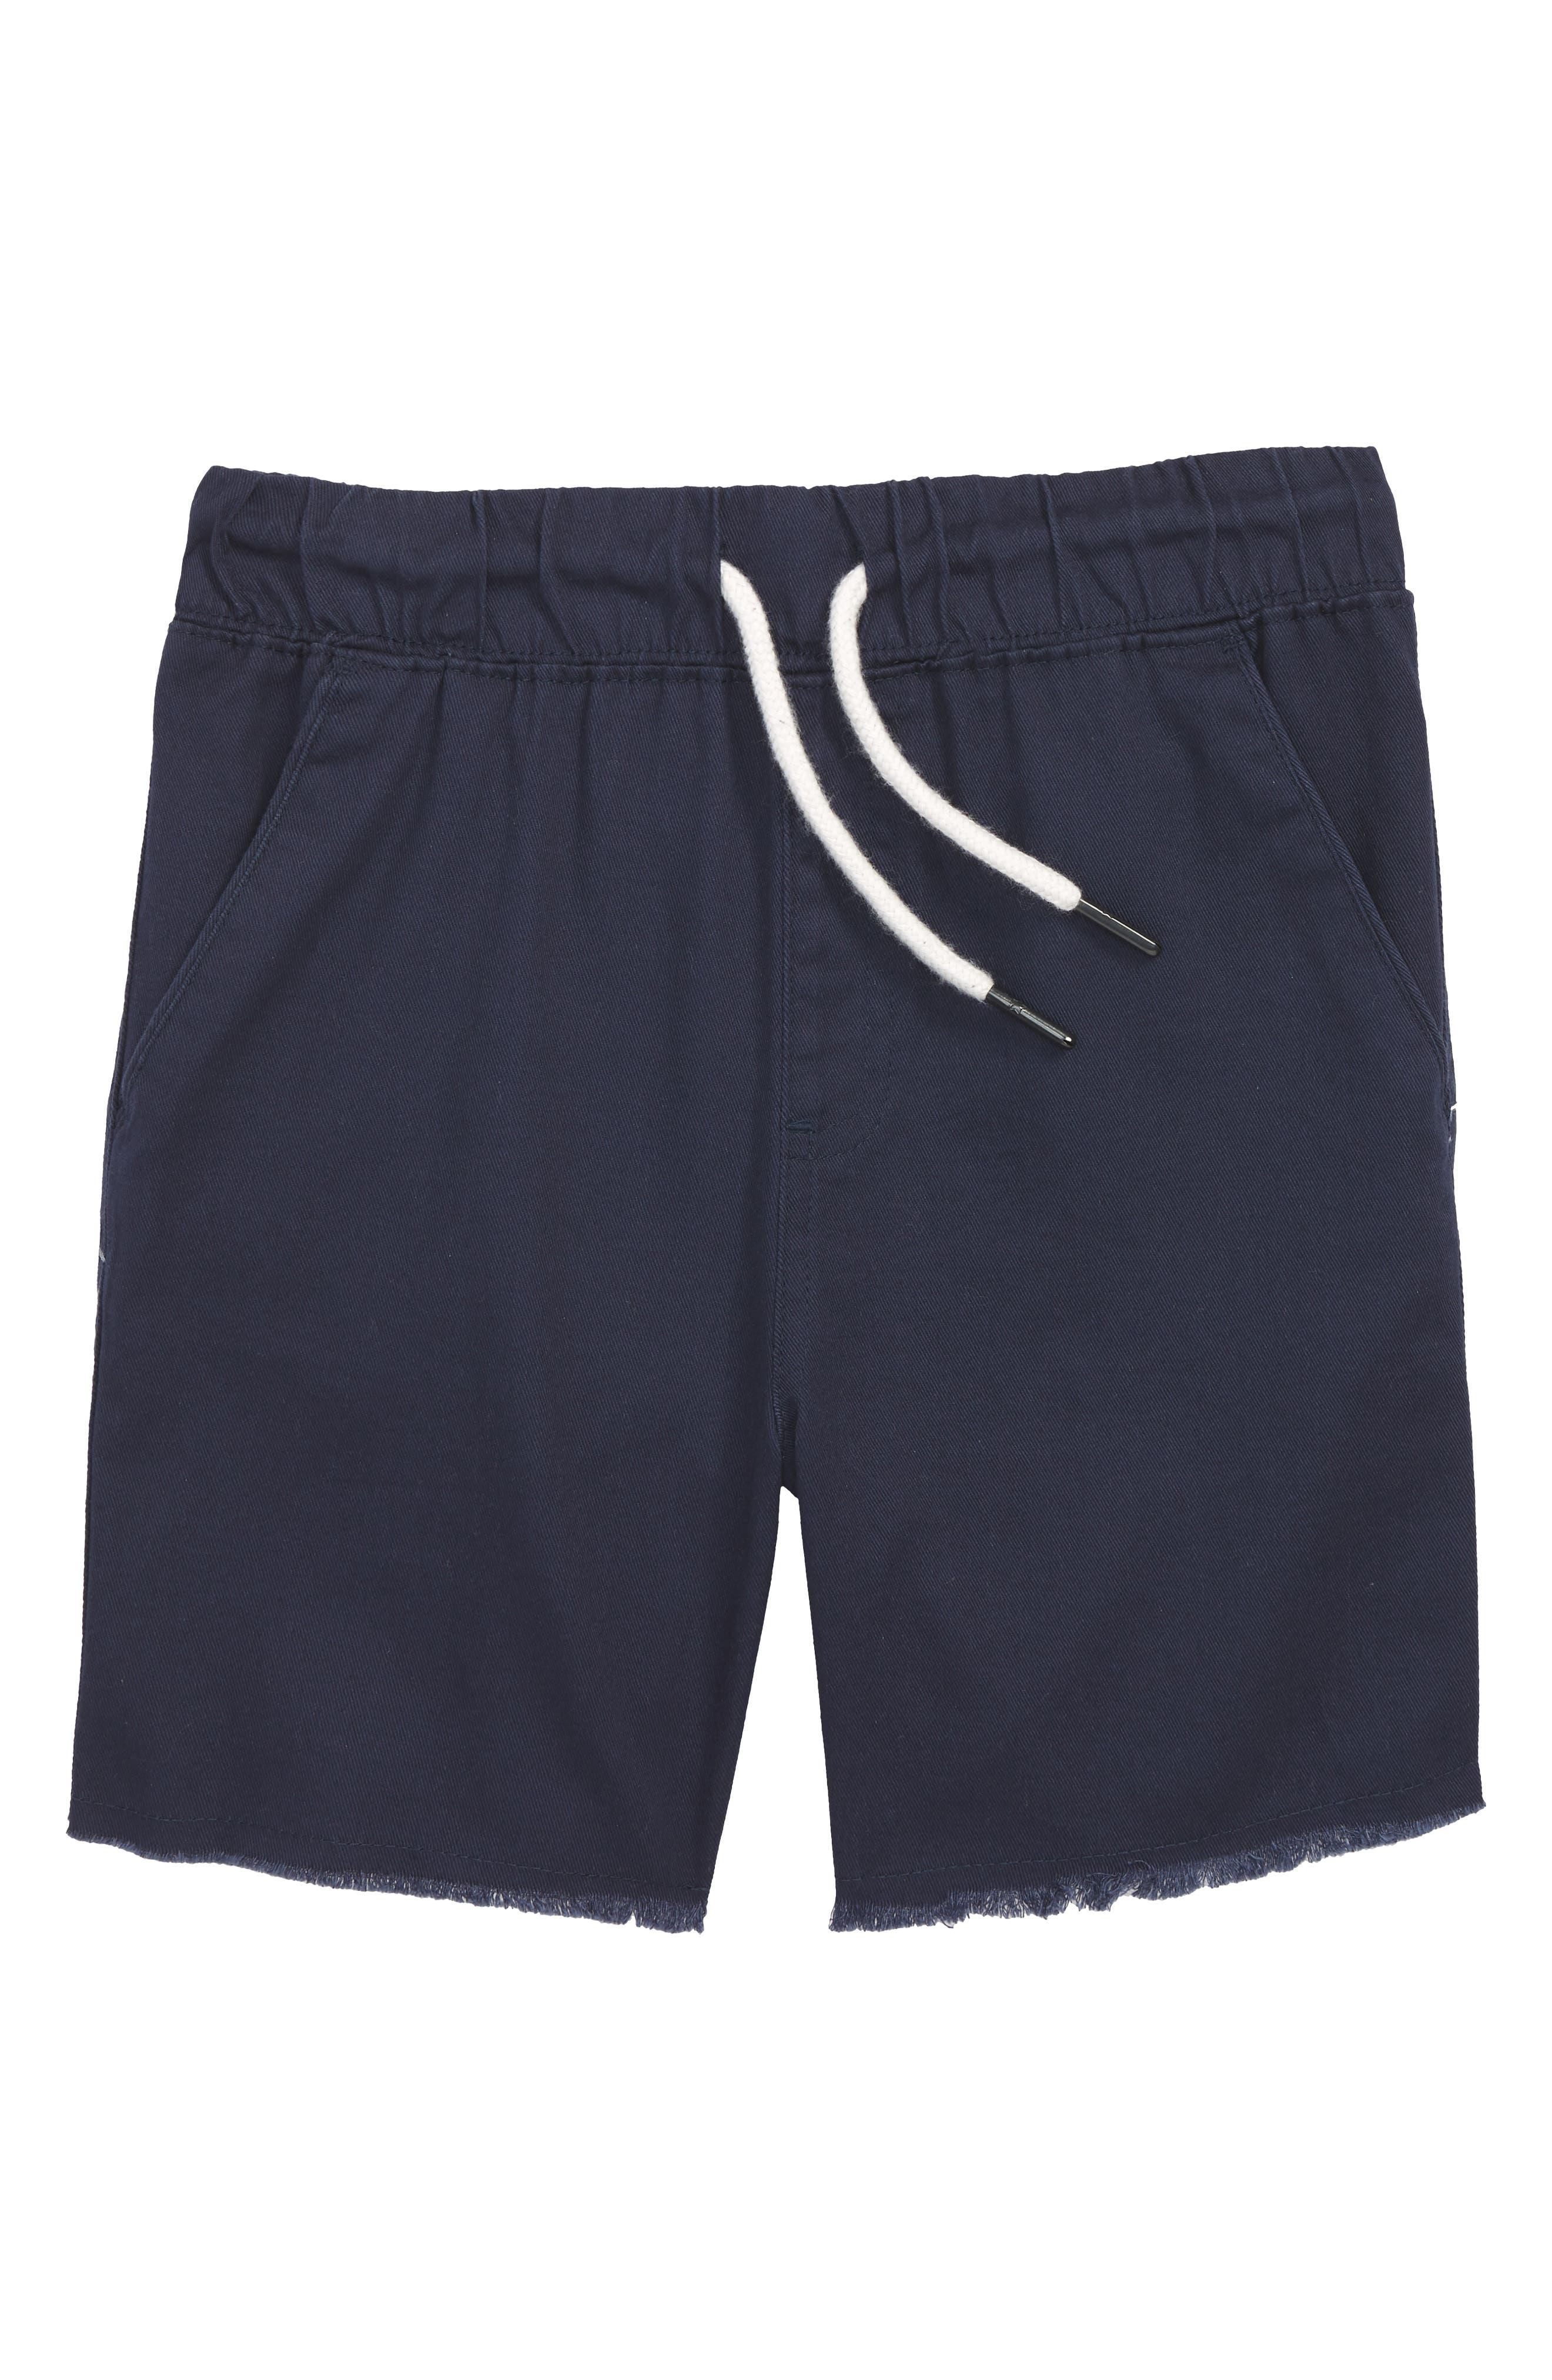 Alaska Shorts,                         Main,                         color, 410